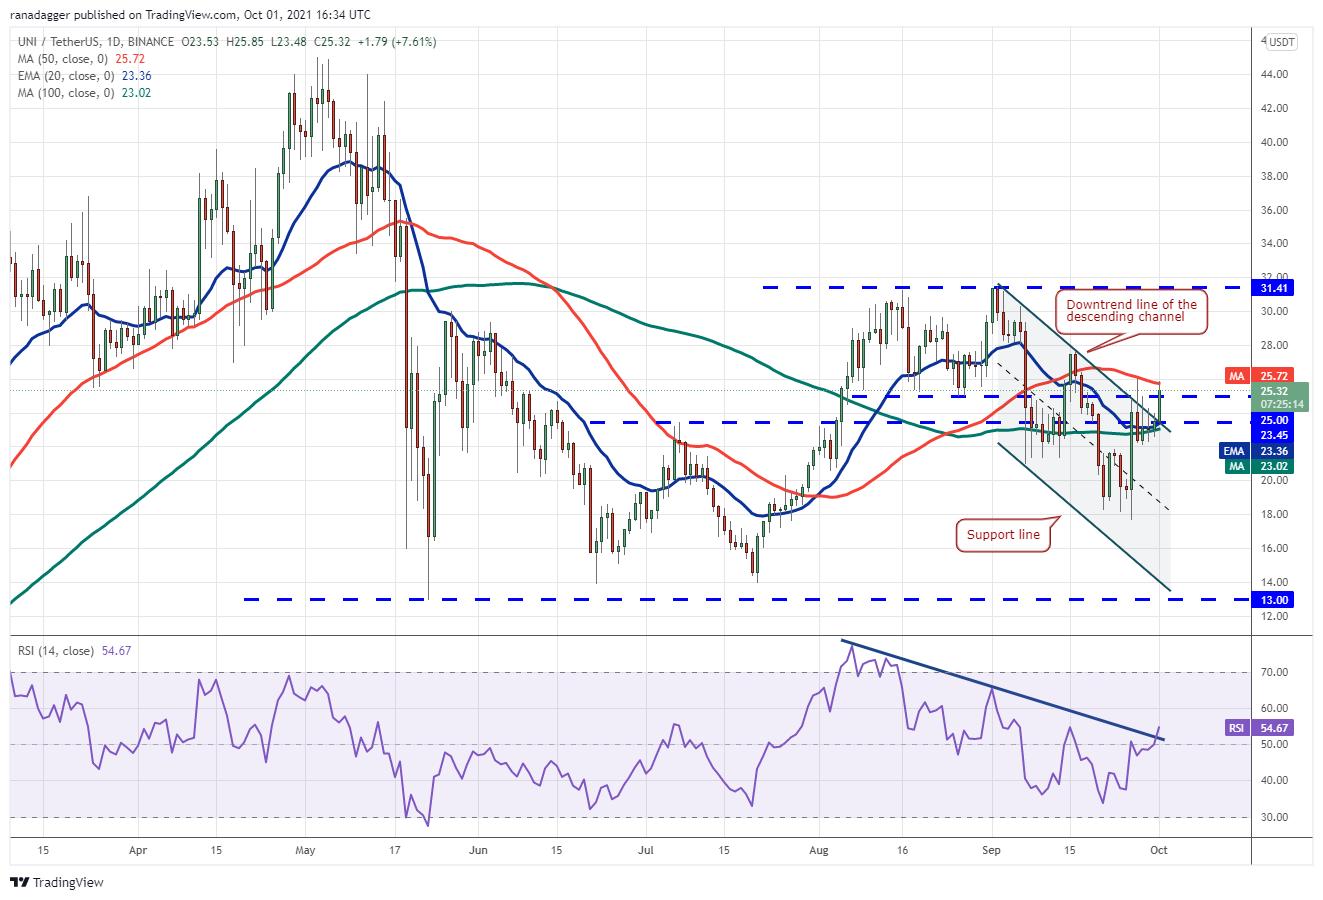 Price analysis 10/1: BTC, ETH, ADA, BNB, XRP, SOL, DOT, DOGE, LUNA, UNI11